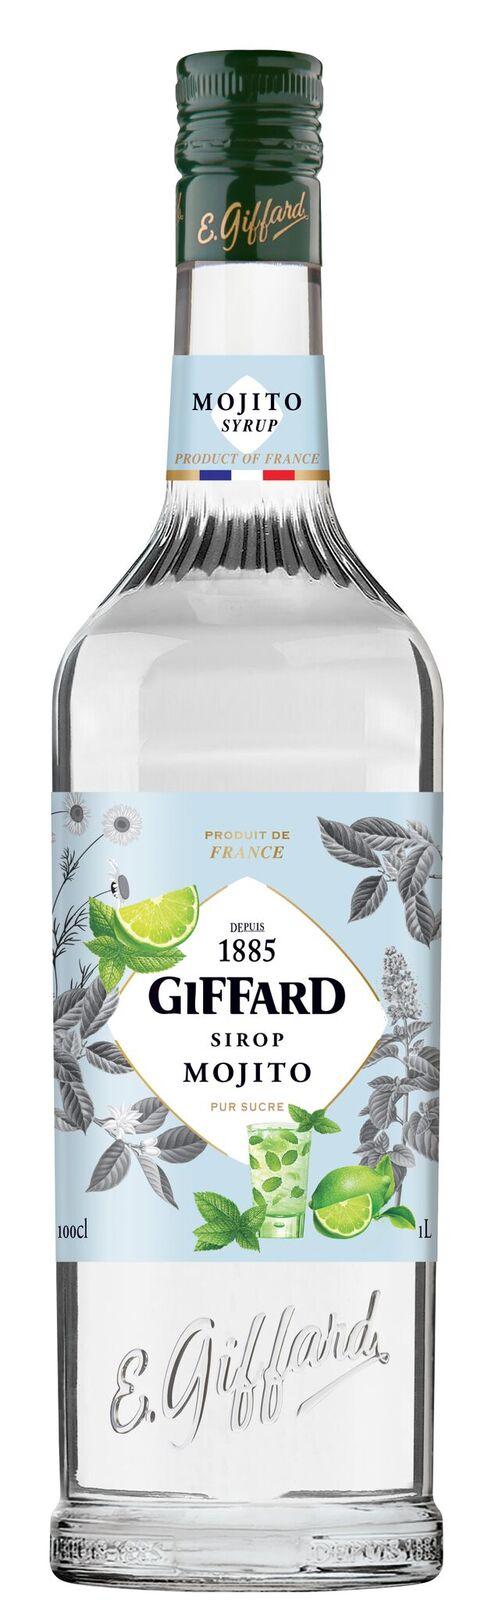 Giffard (sirupy, likéry) Giffard Mojito sirup 1l